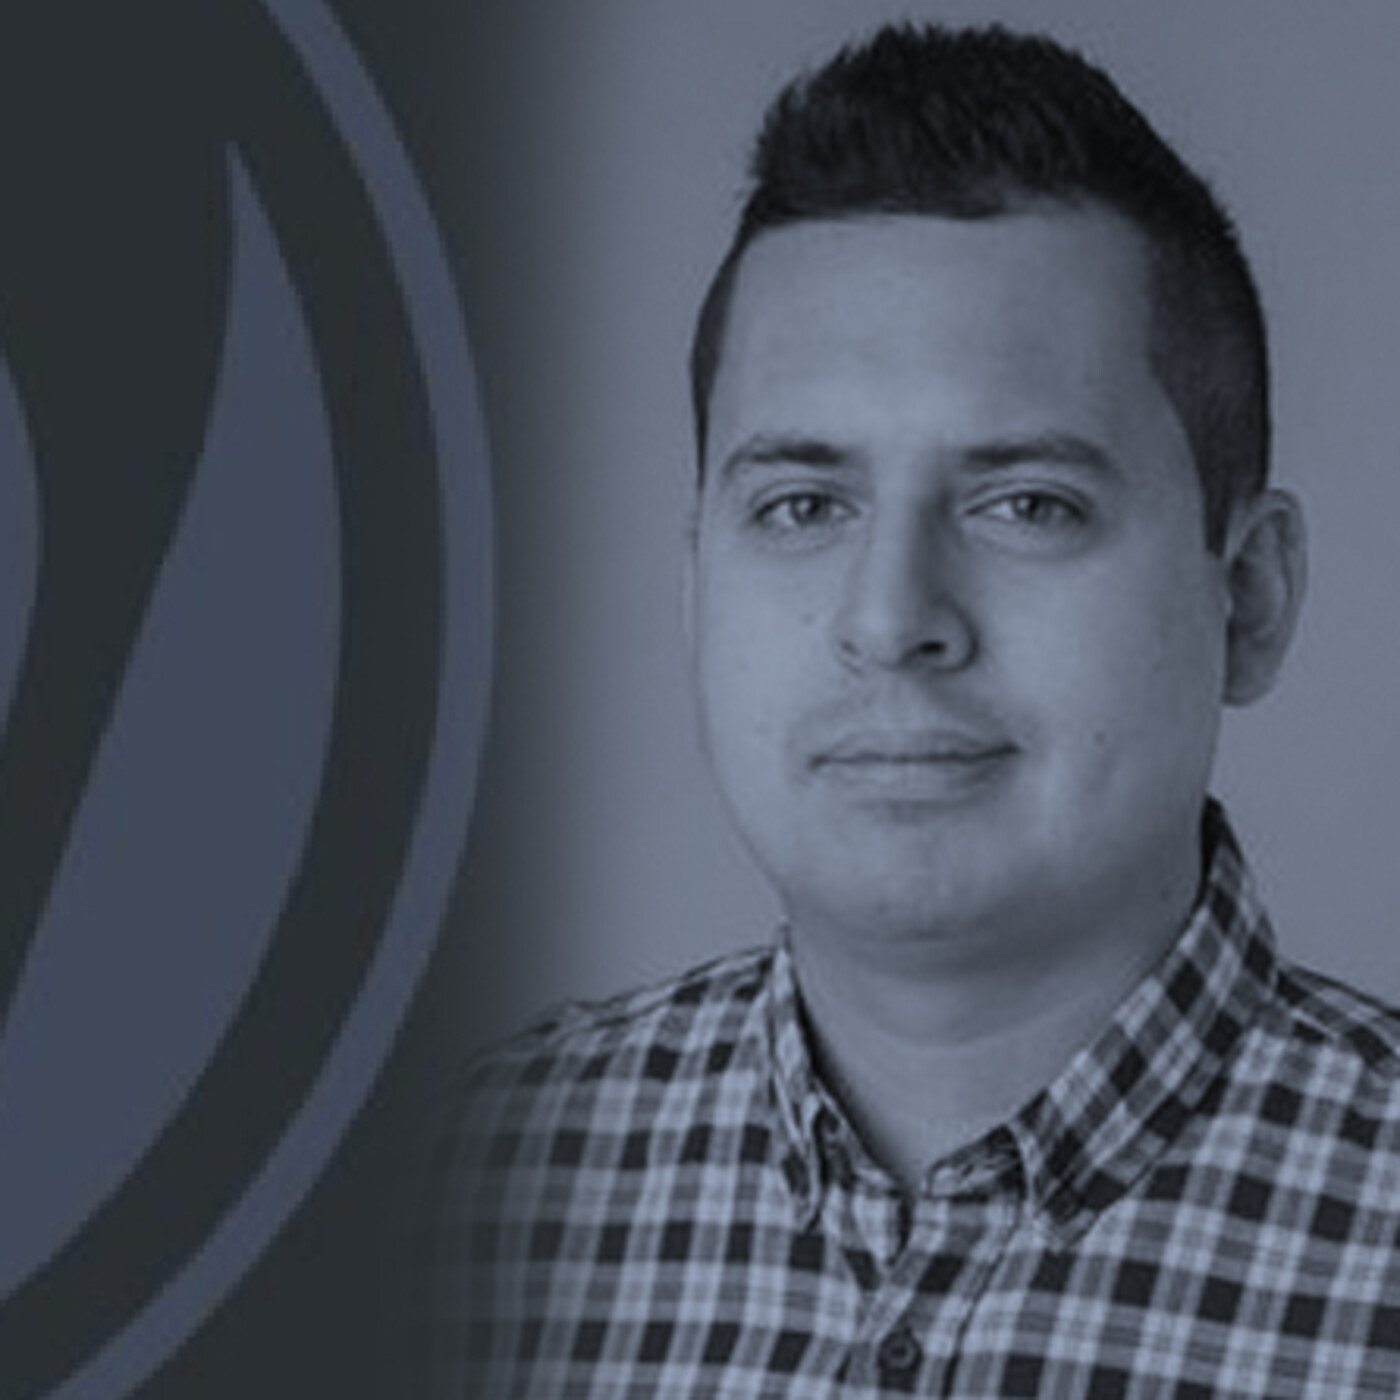 Cómo monetizar un blog con WordPress. Con Dean Romero